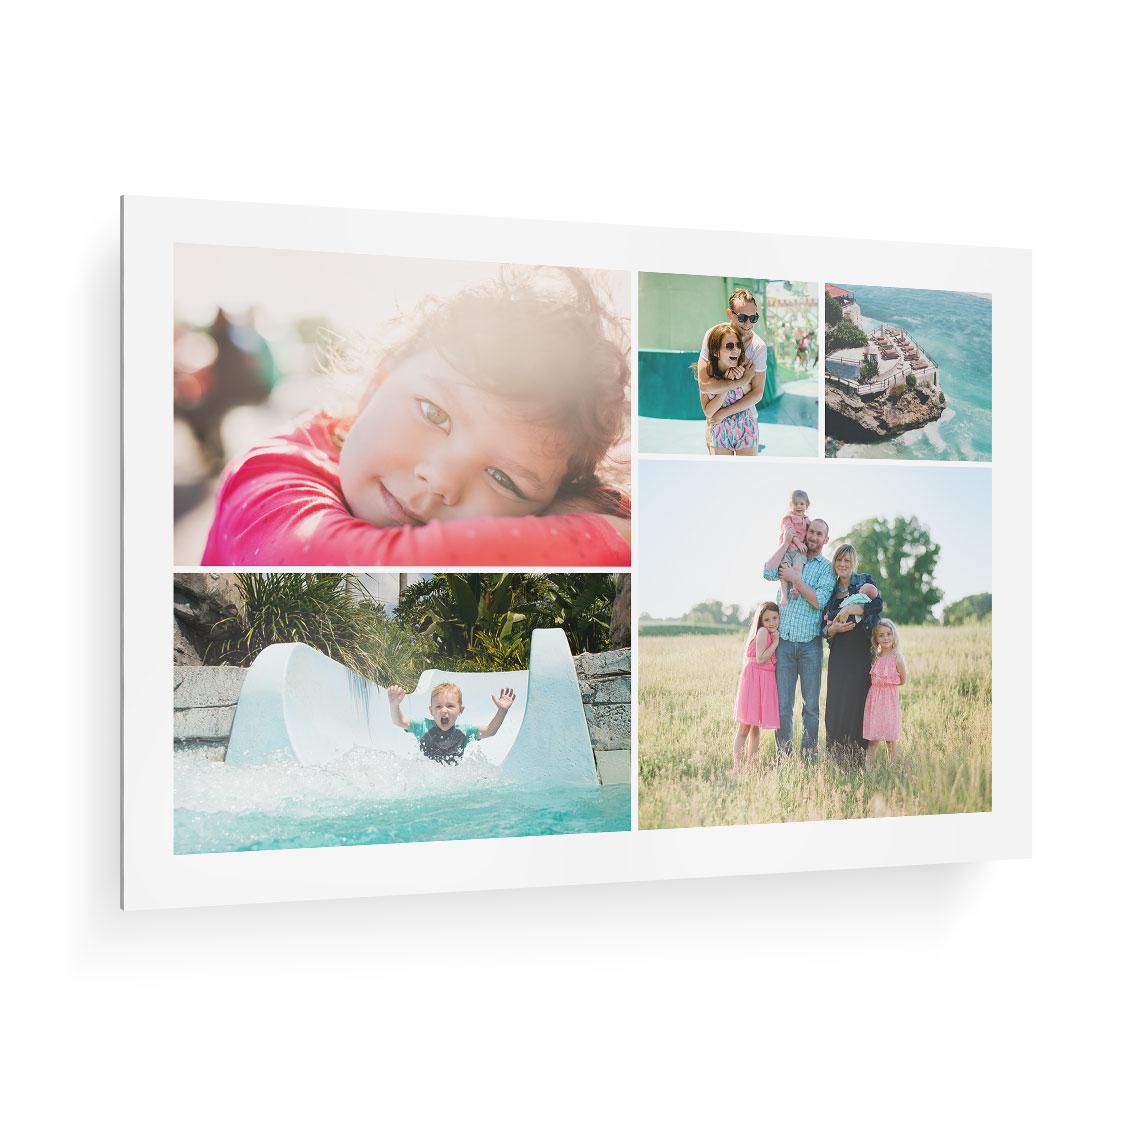 premium collage metal print 50x75cm 20x30 glass metal collage